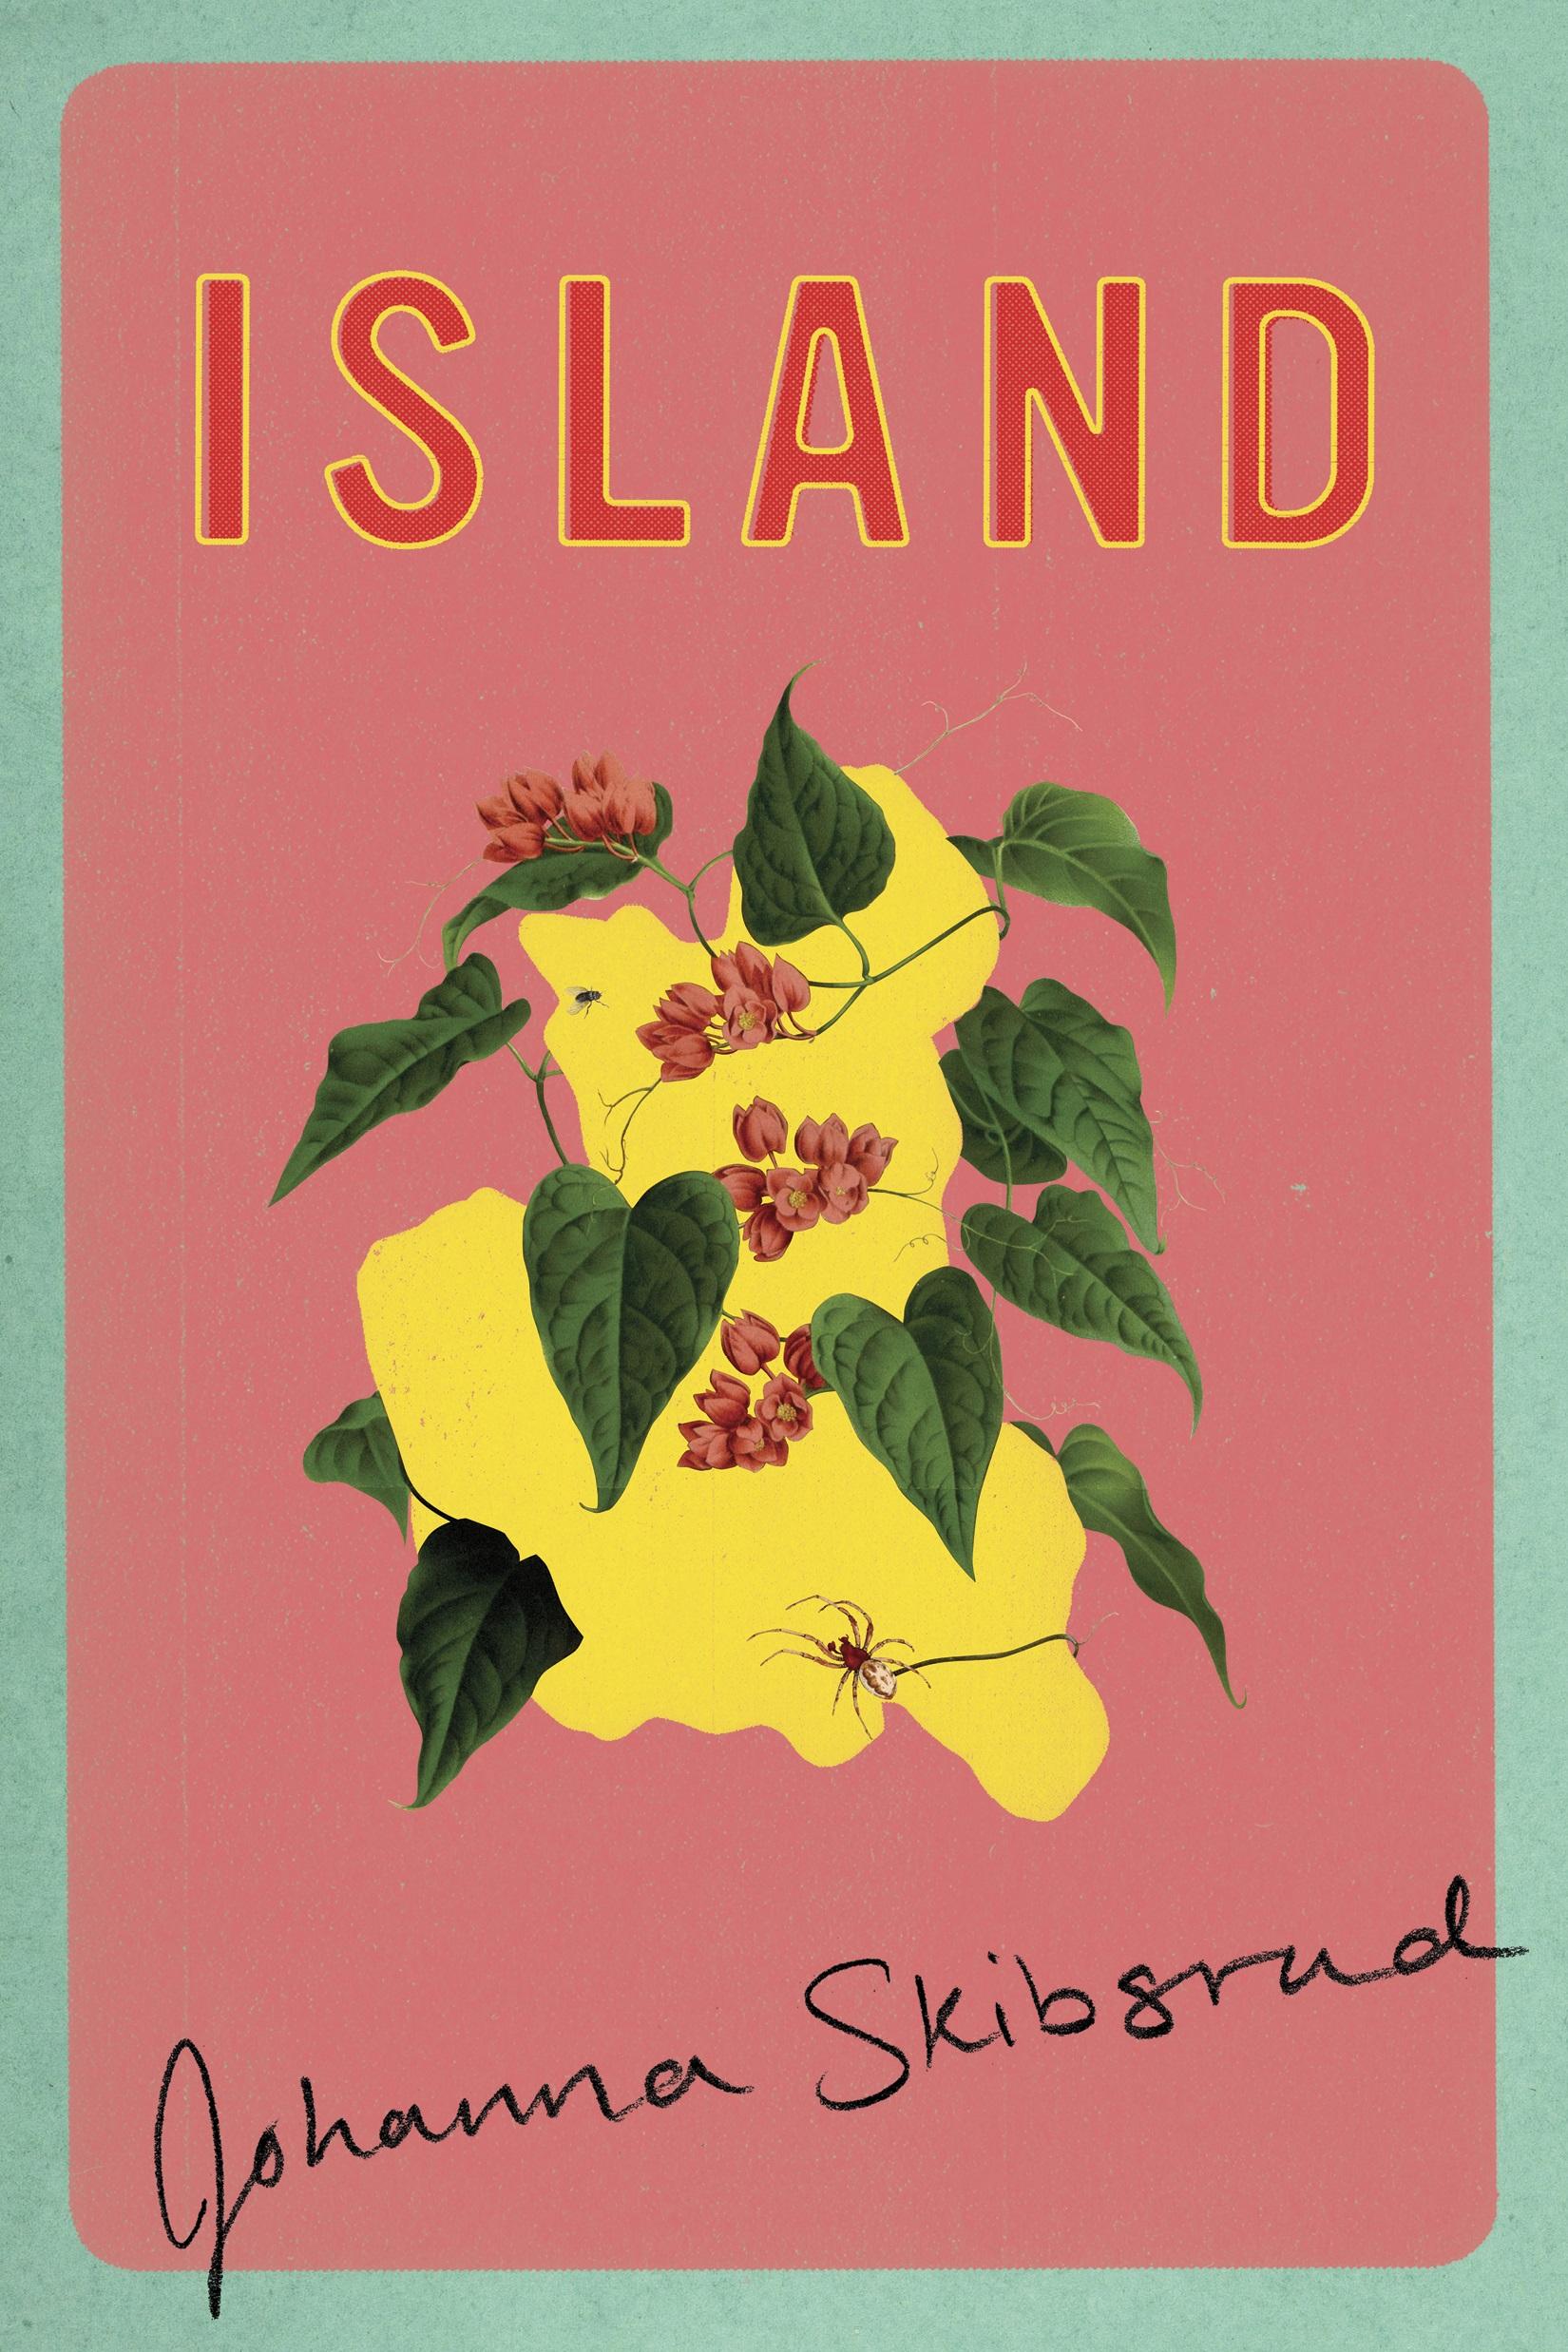 Island.jpg